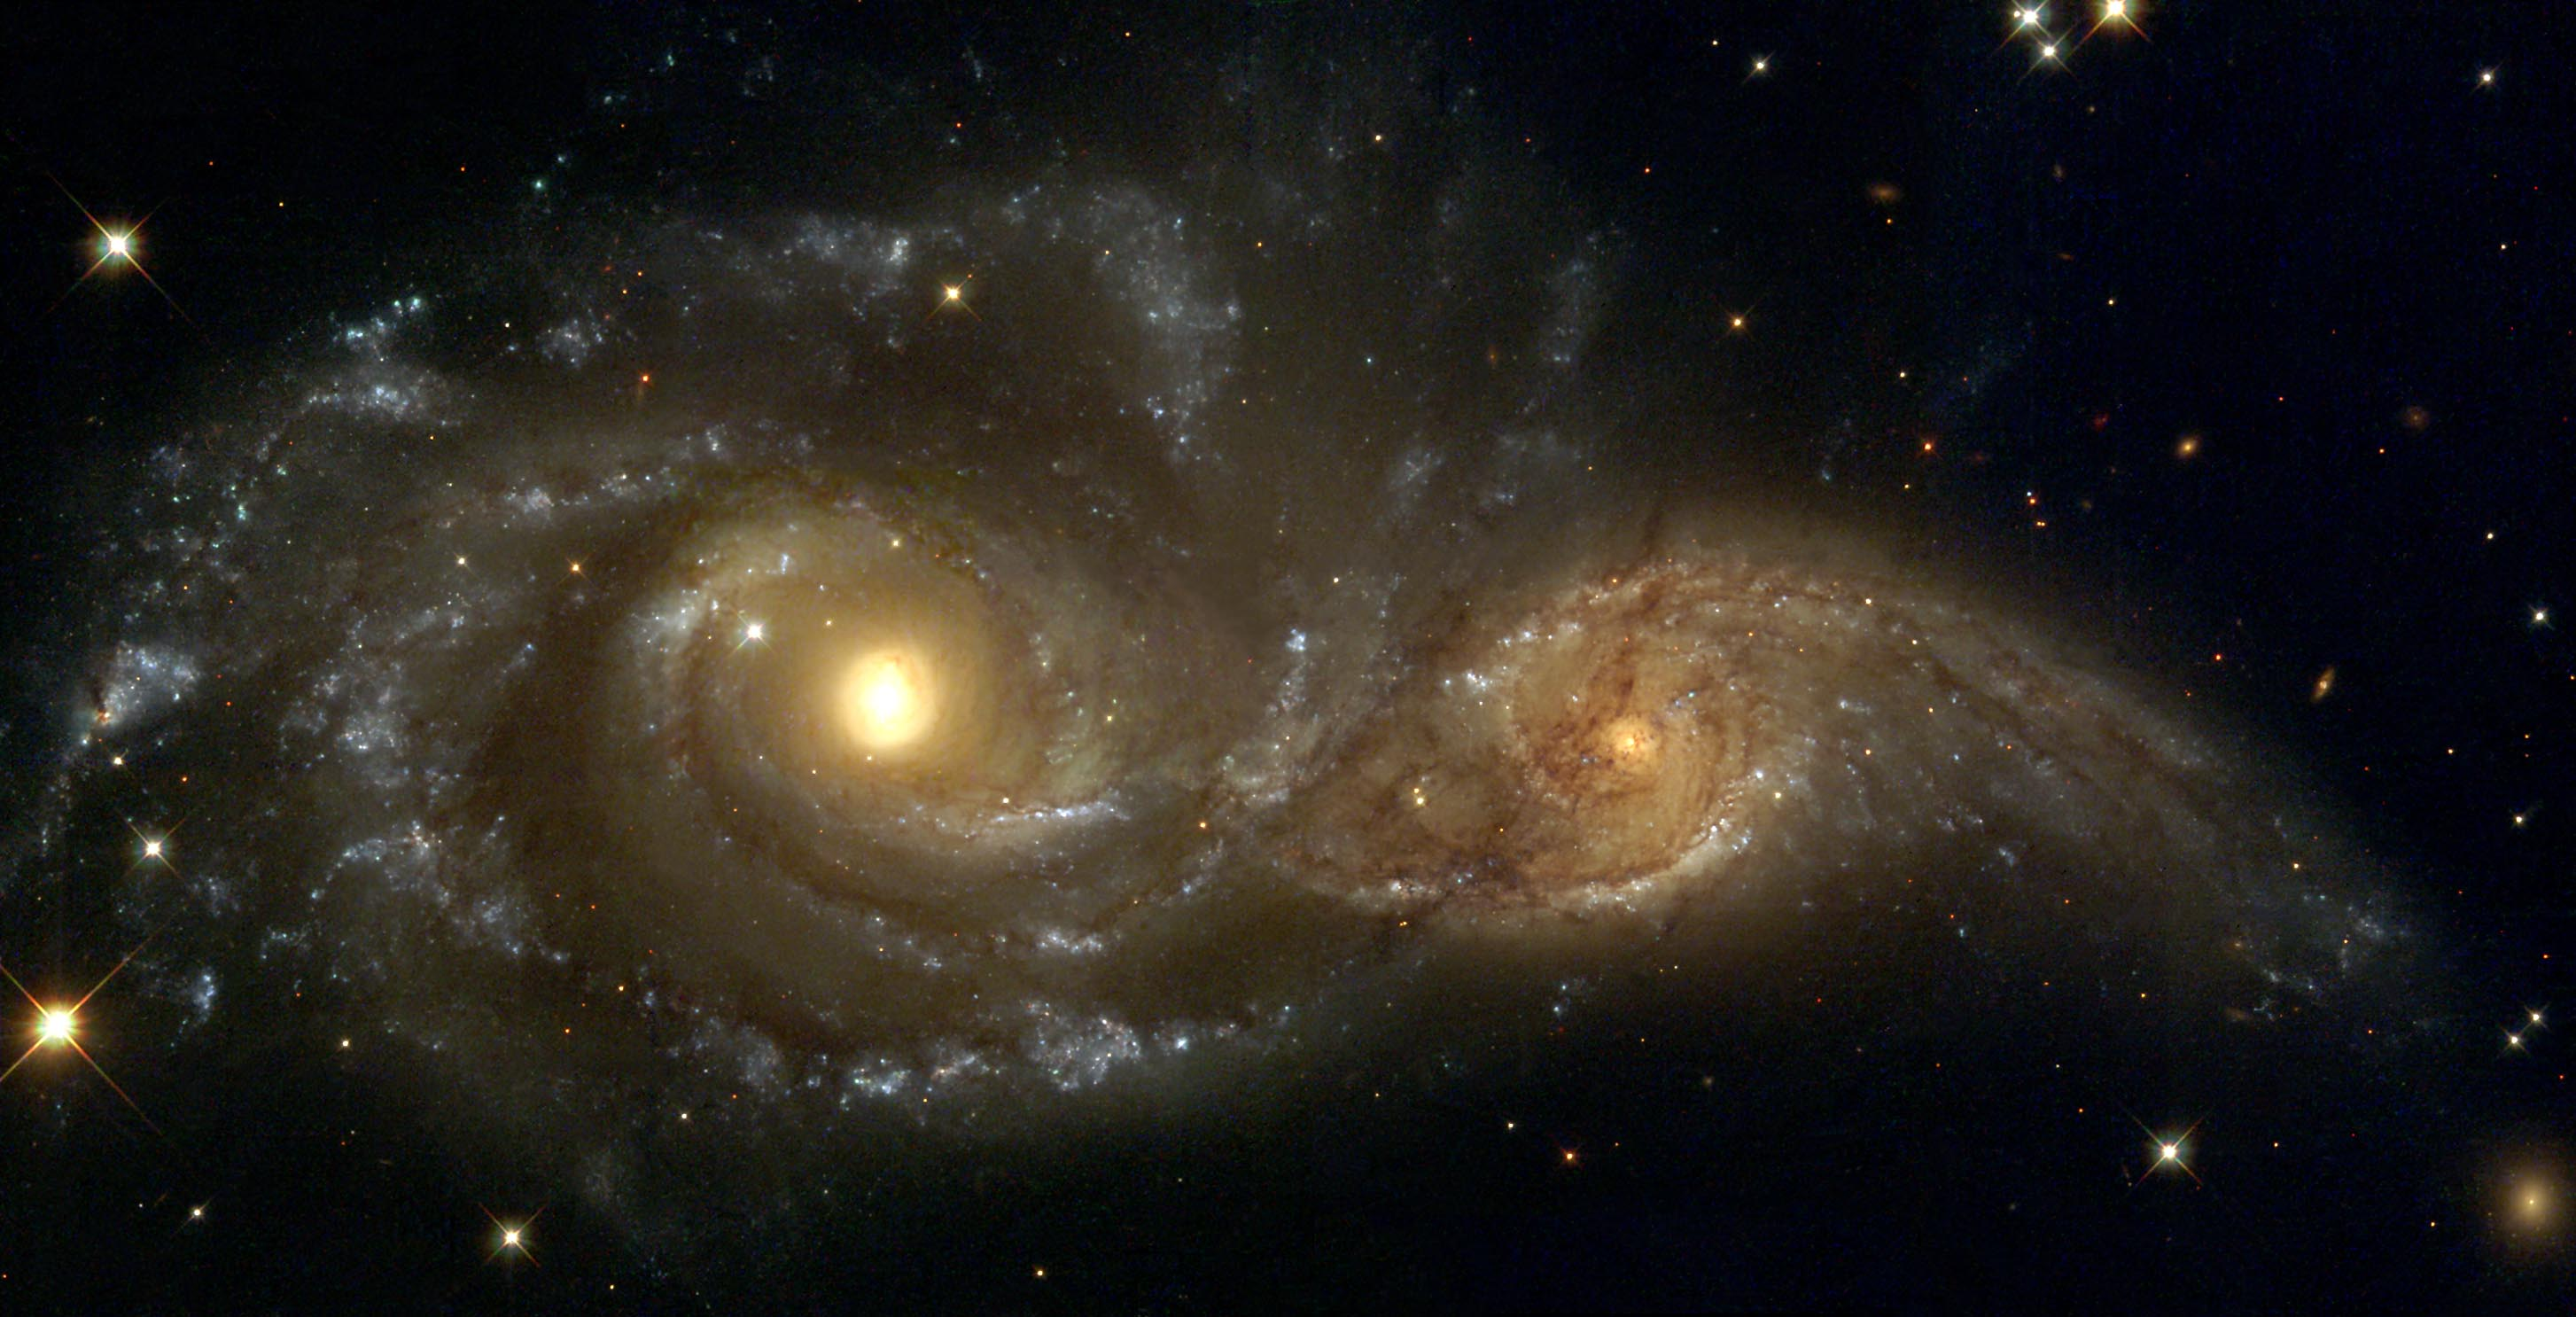 NGC2207_IC2163-I-GRB-HST2005.jpg